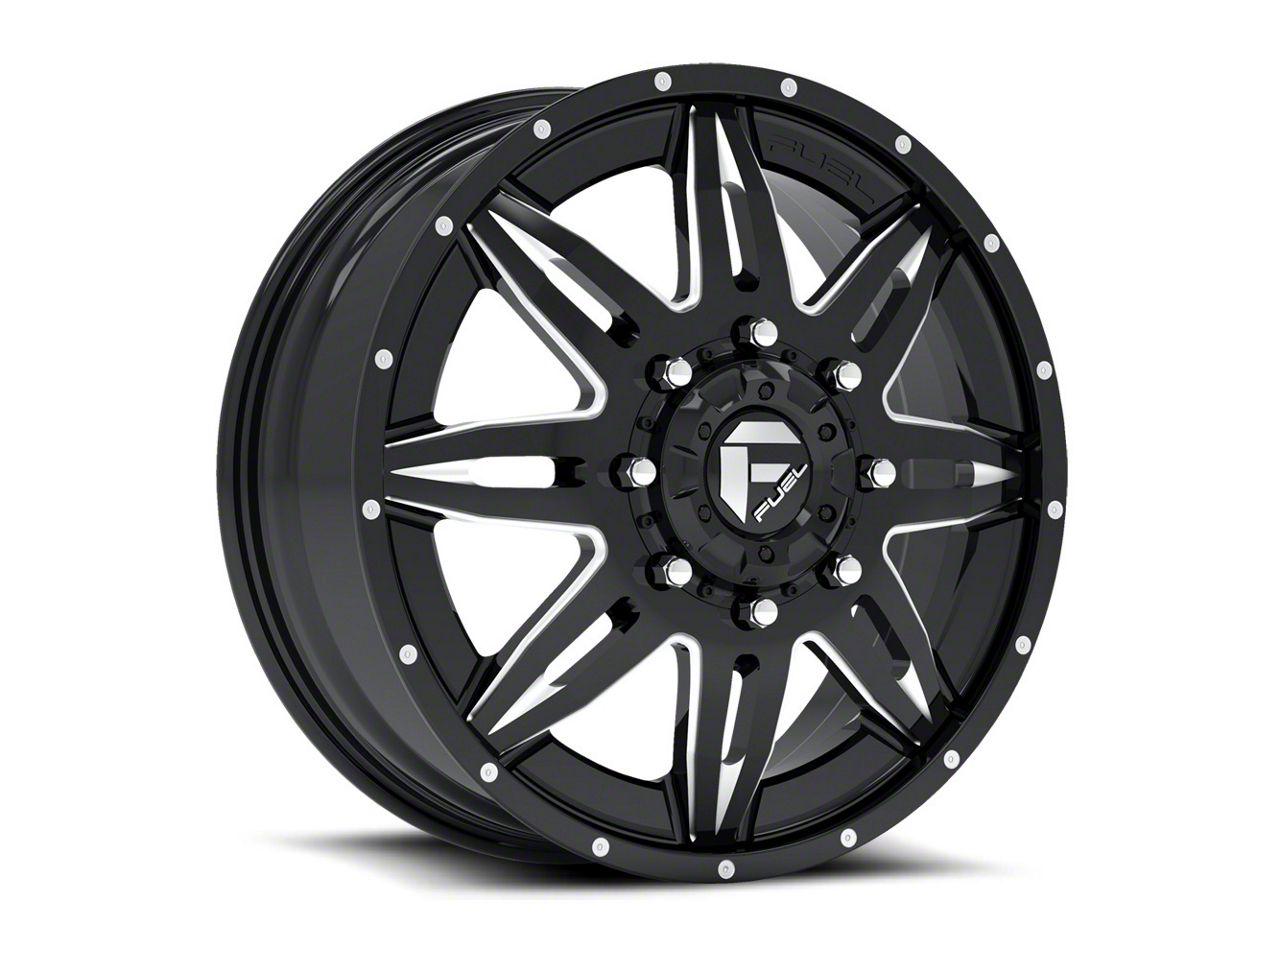 Fuel Wheels Lethal Black Milled 6-Lug Wheel - 22x14 (99-18 Silverado 1500)